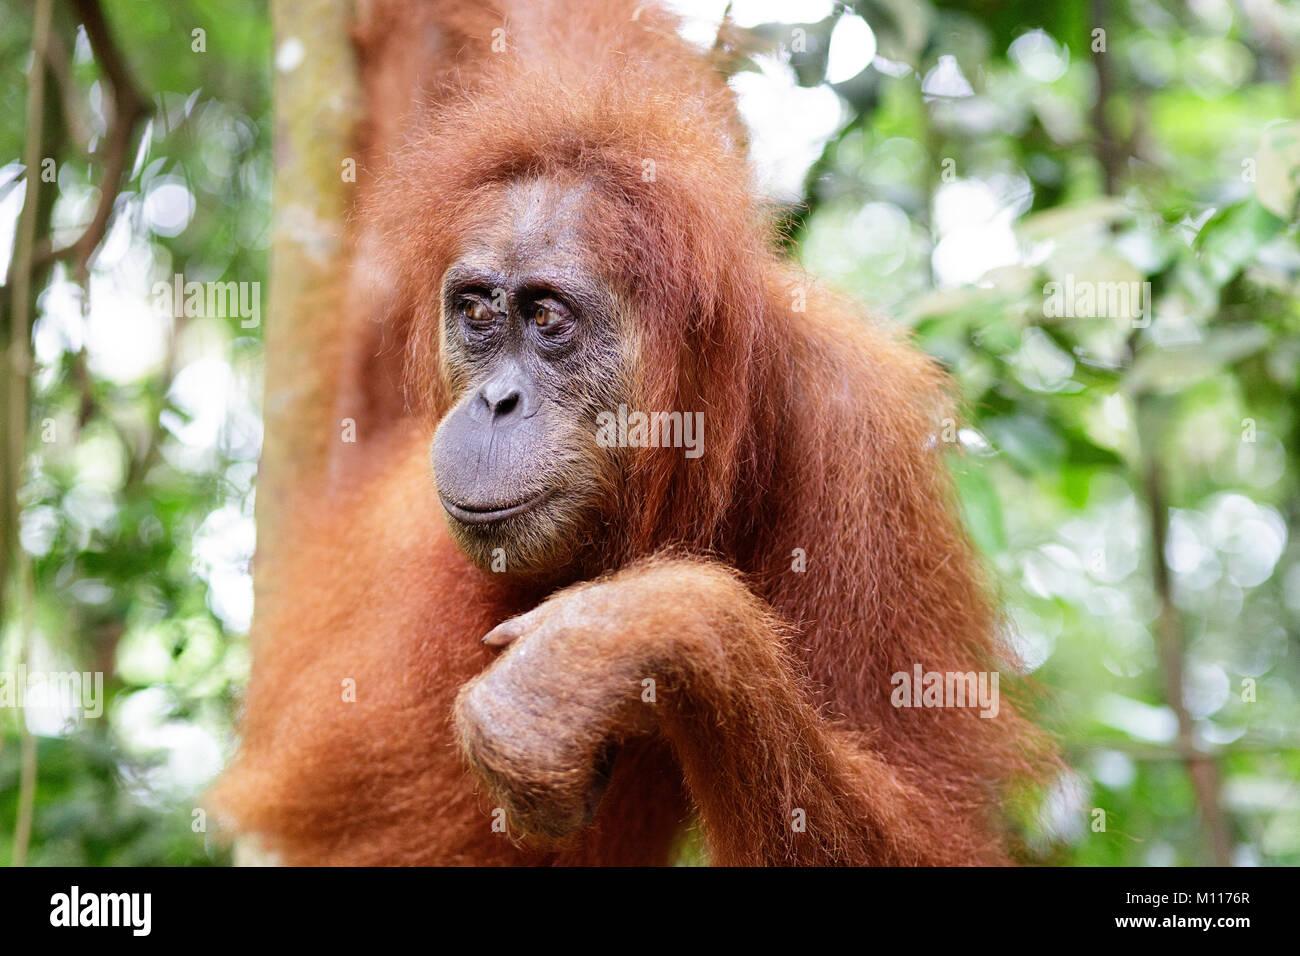 Adult female orangutan hanging from tree branches in Gunung Leuser National Park, Sumatra, Indonesia. - Stock Image